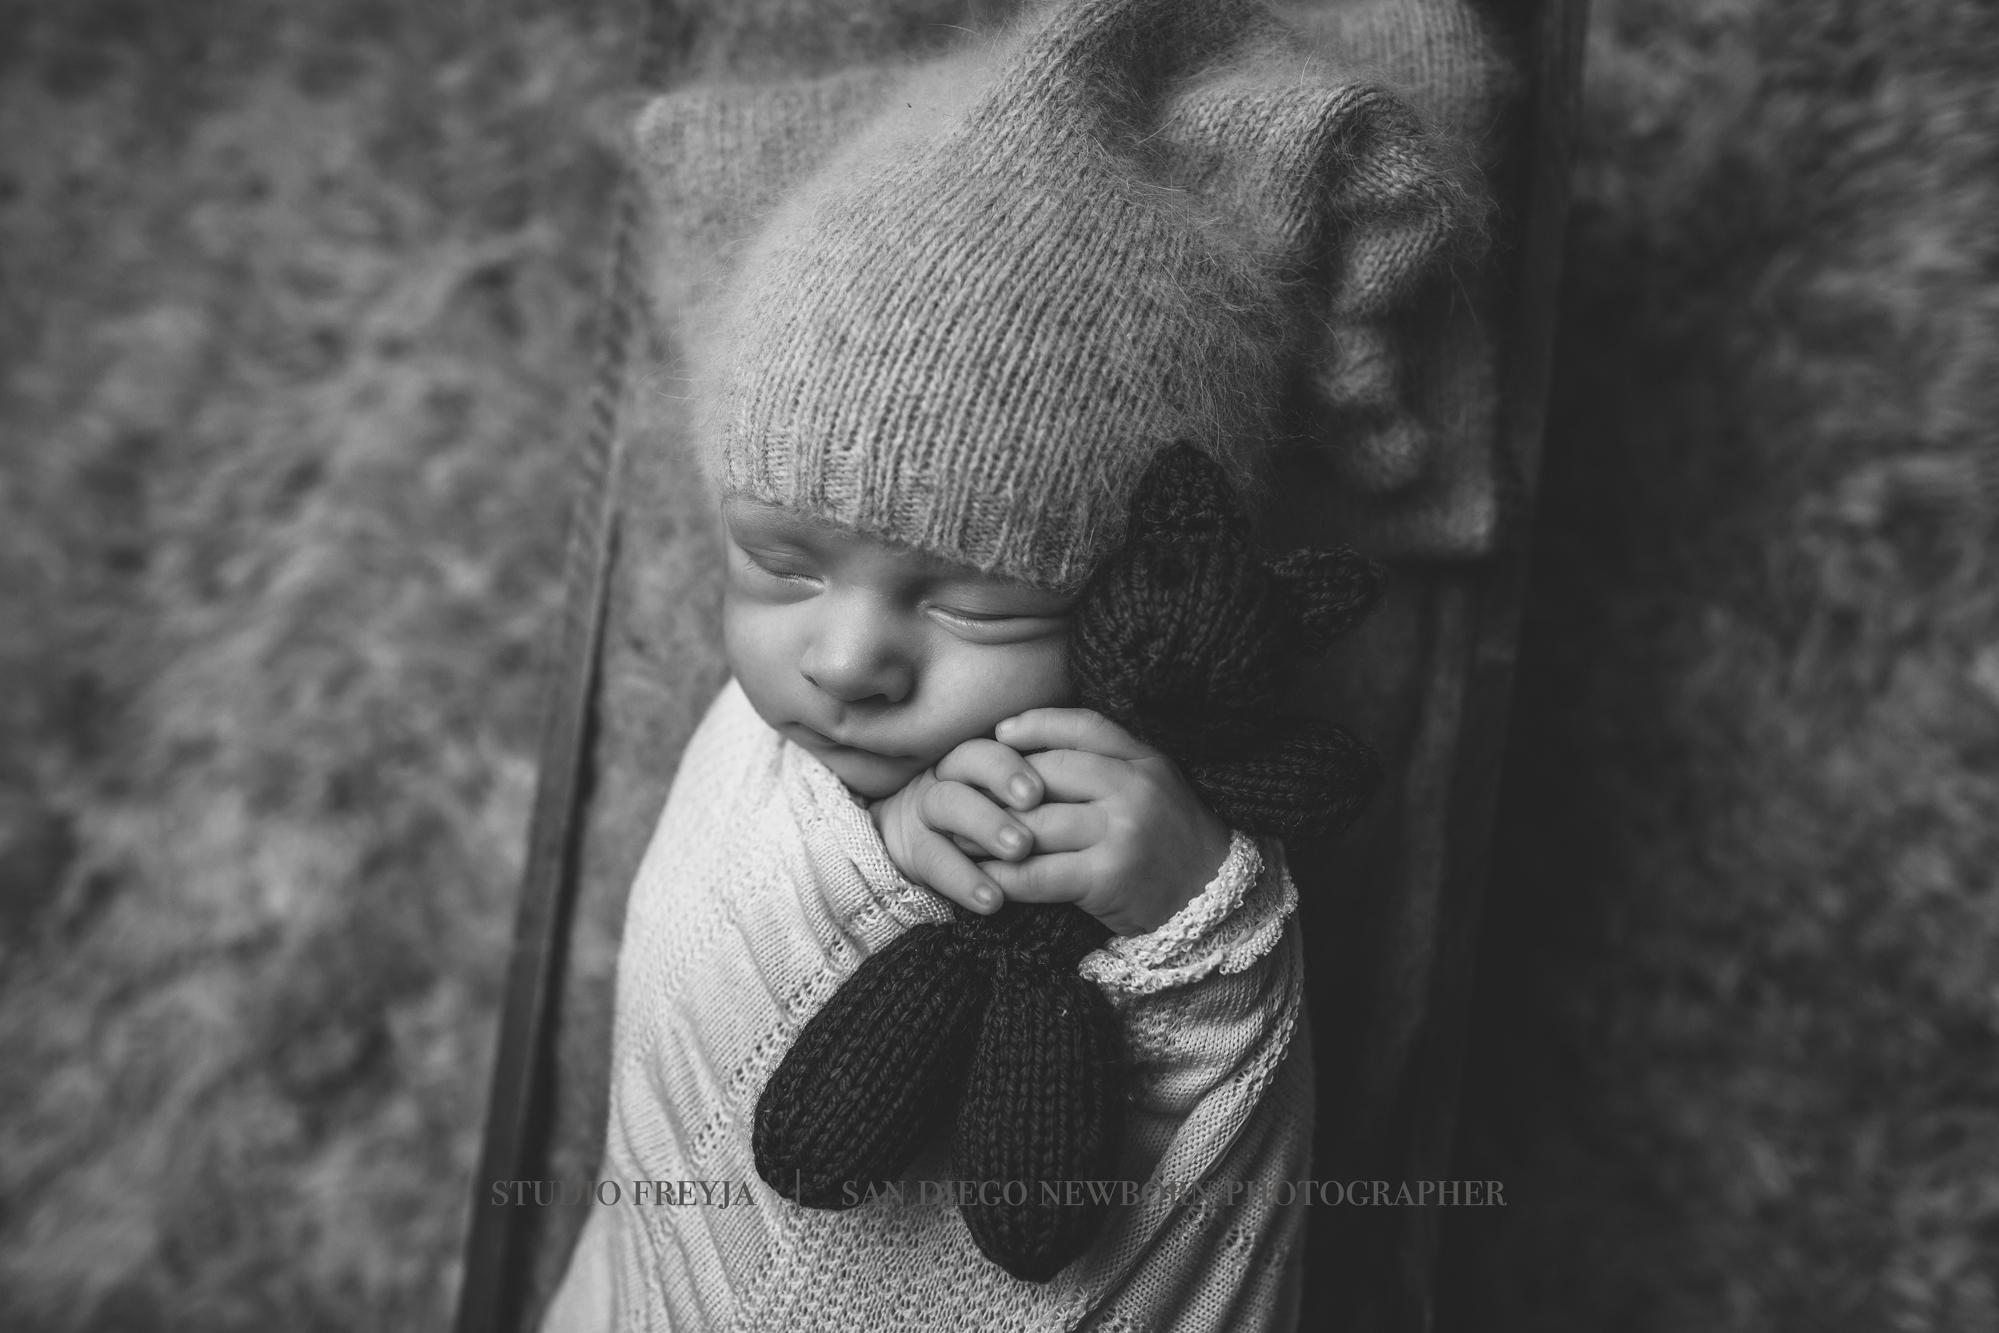 Ronan Newborn Pictures Copyright Studio Freyja (18 of 50).jpg